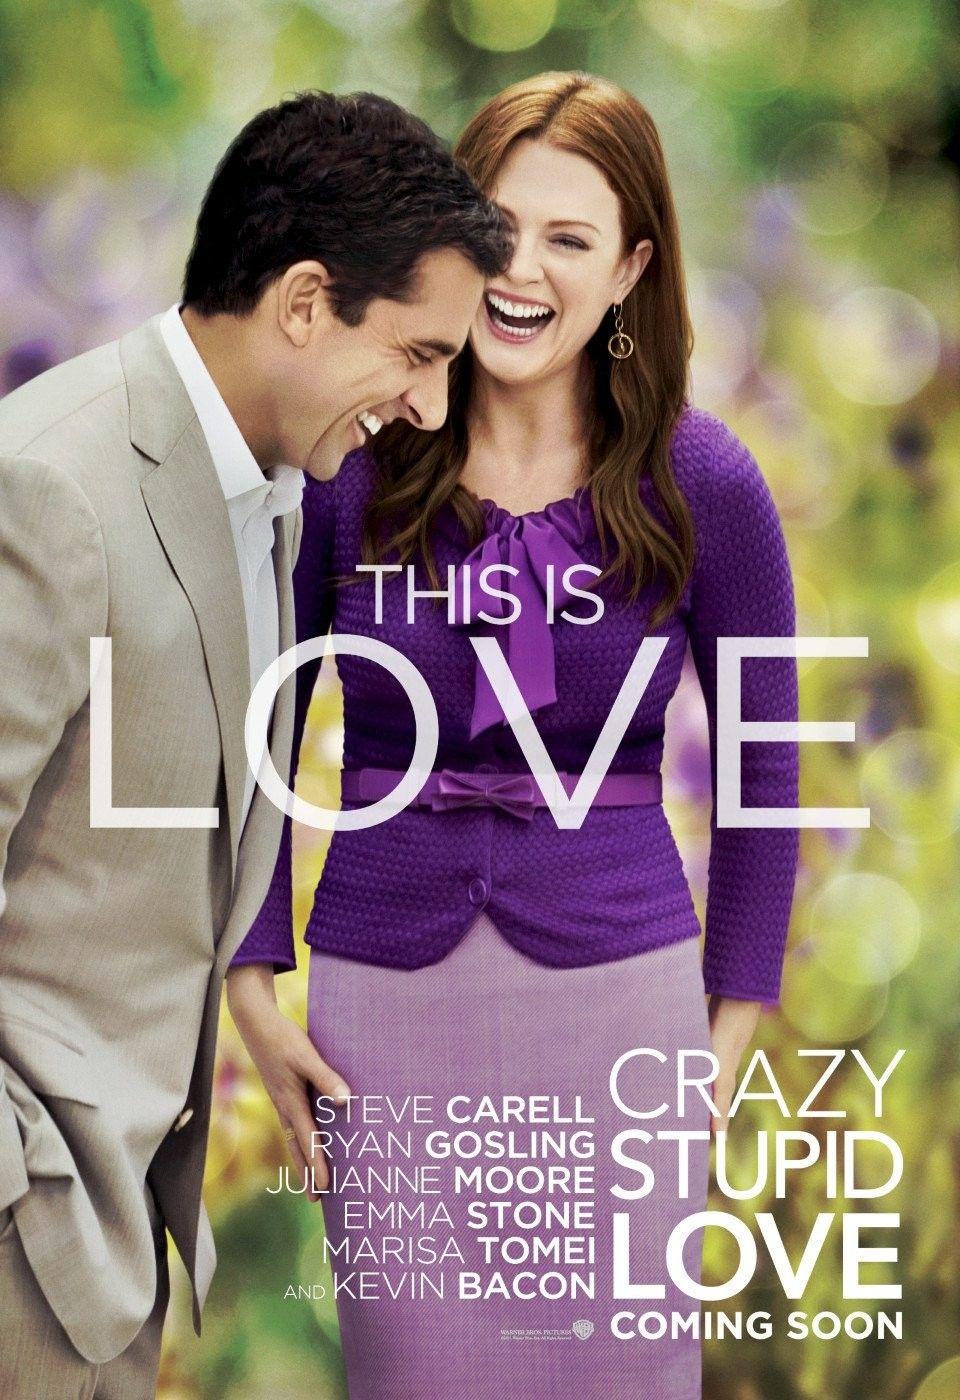 Crazy Stupid Love Crazy Stupid Love Stupid Love Crazy Stupid Love Movie